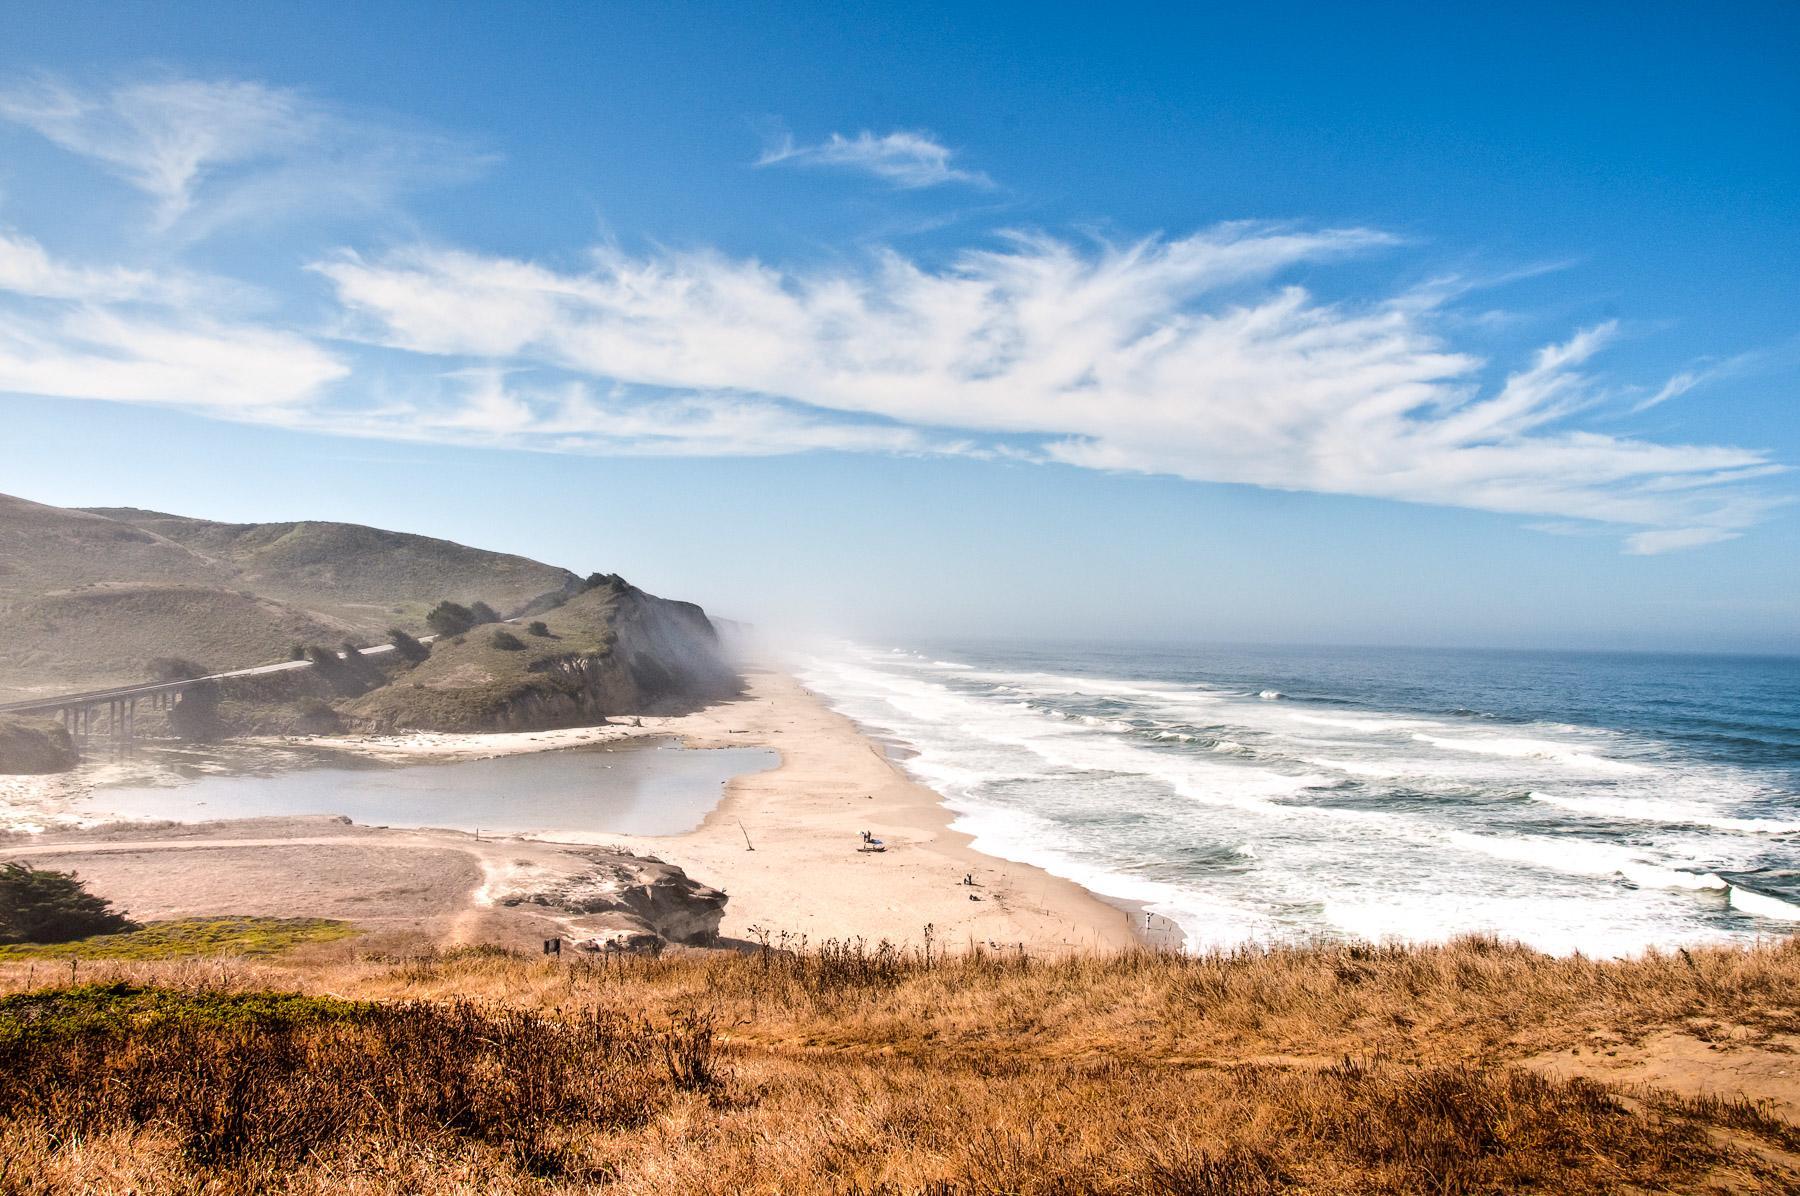 Nudist Beach Experiences - The Best Nude Beaches in the U.S.